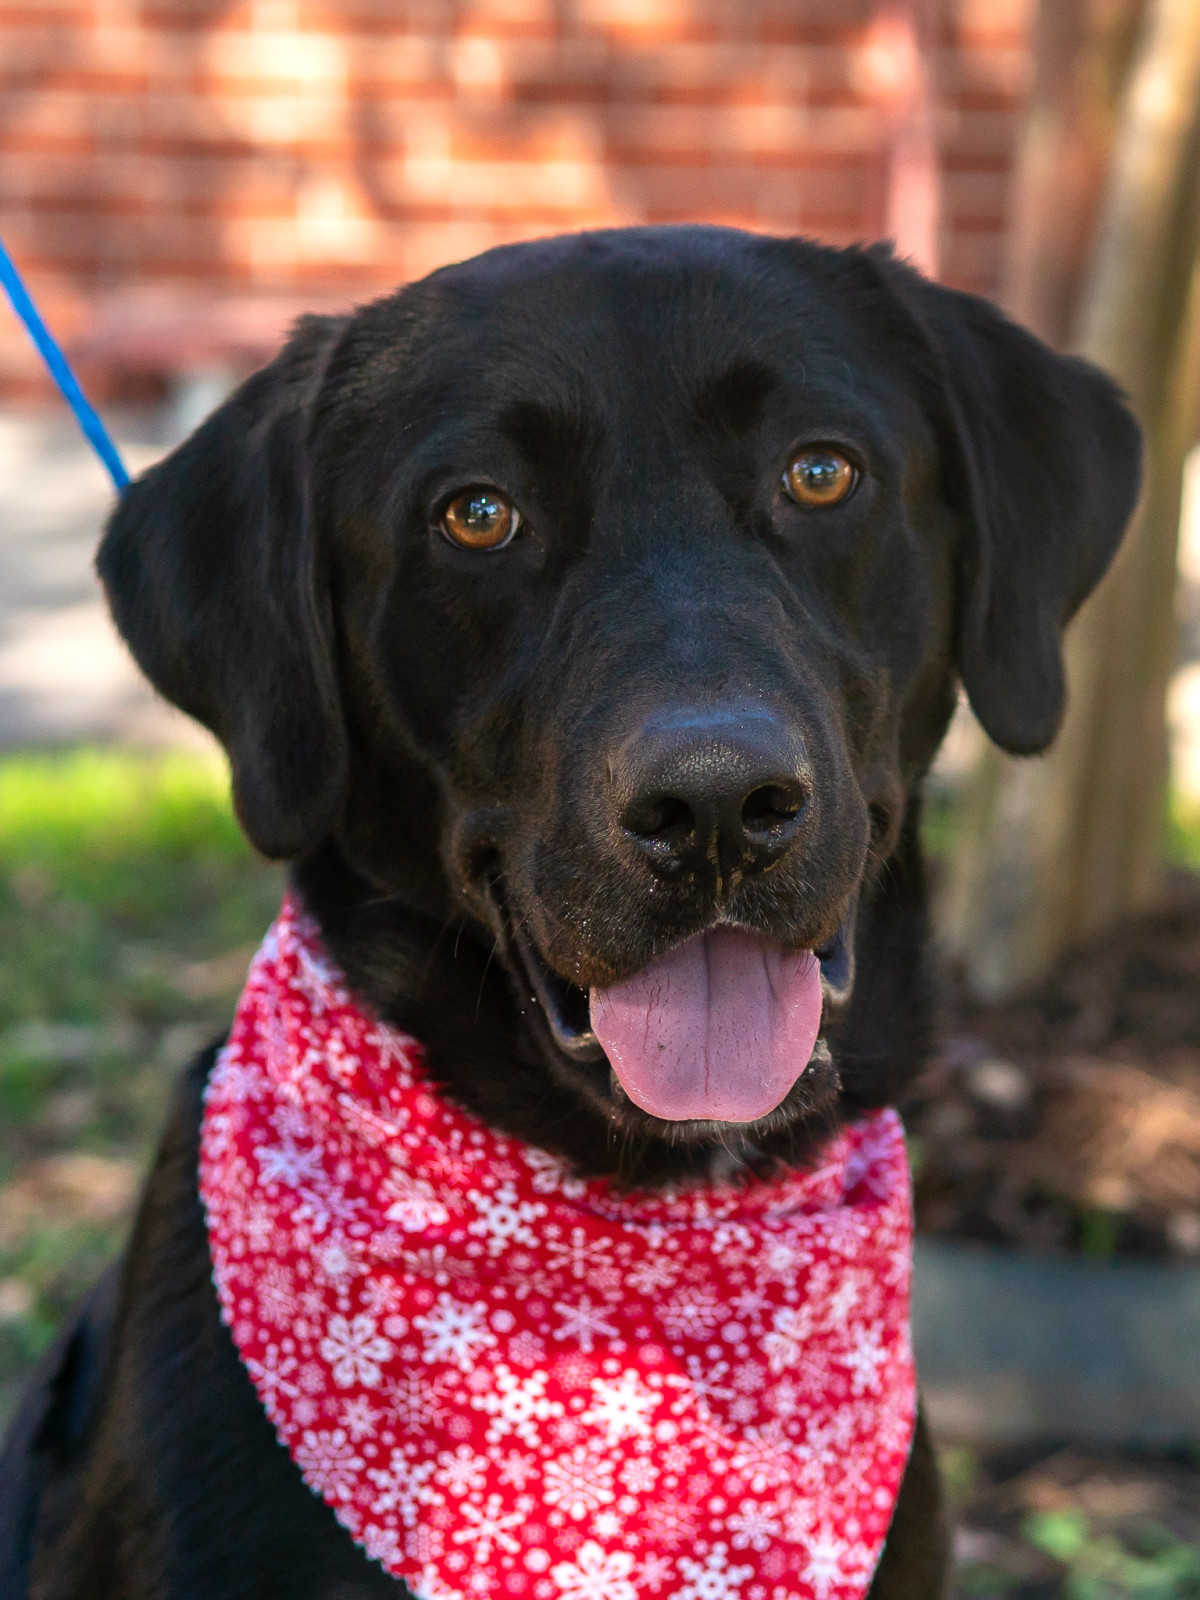 Pet of the week - Will Labrador retriever